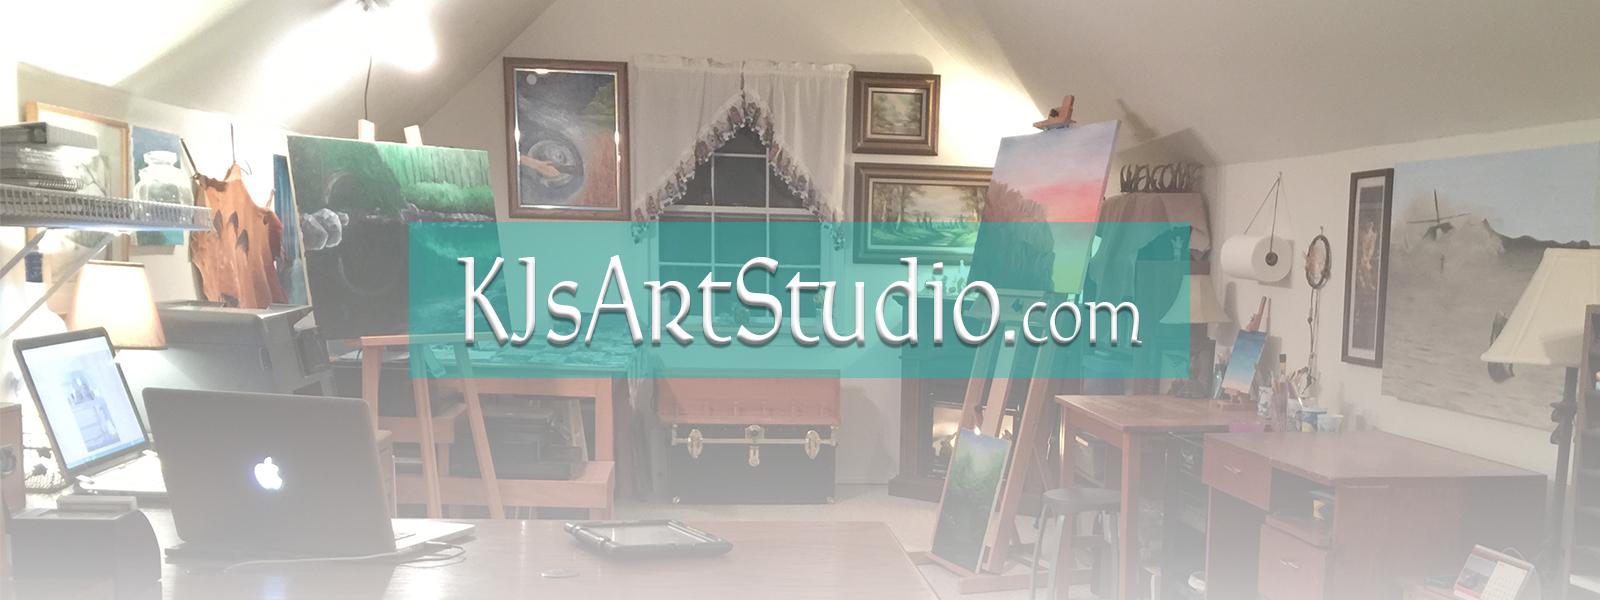 KJ's Art Studio ~ KJsArtStudio.com | Original Fine Art by American Fine Artist, KJ Burk. ~ Oil Paintings, Acrylic Paintings, Mixed Medium Art, Pastel Paintings, Watercolor Paintings, Illustrations and Digital Graphic Art